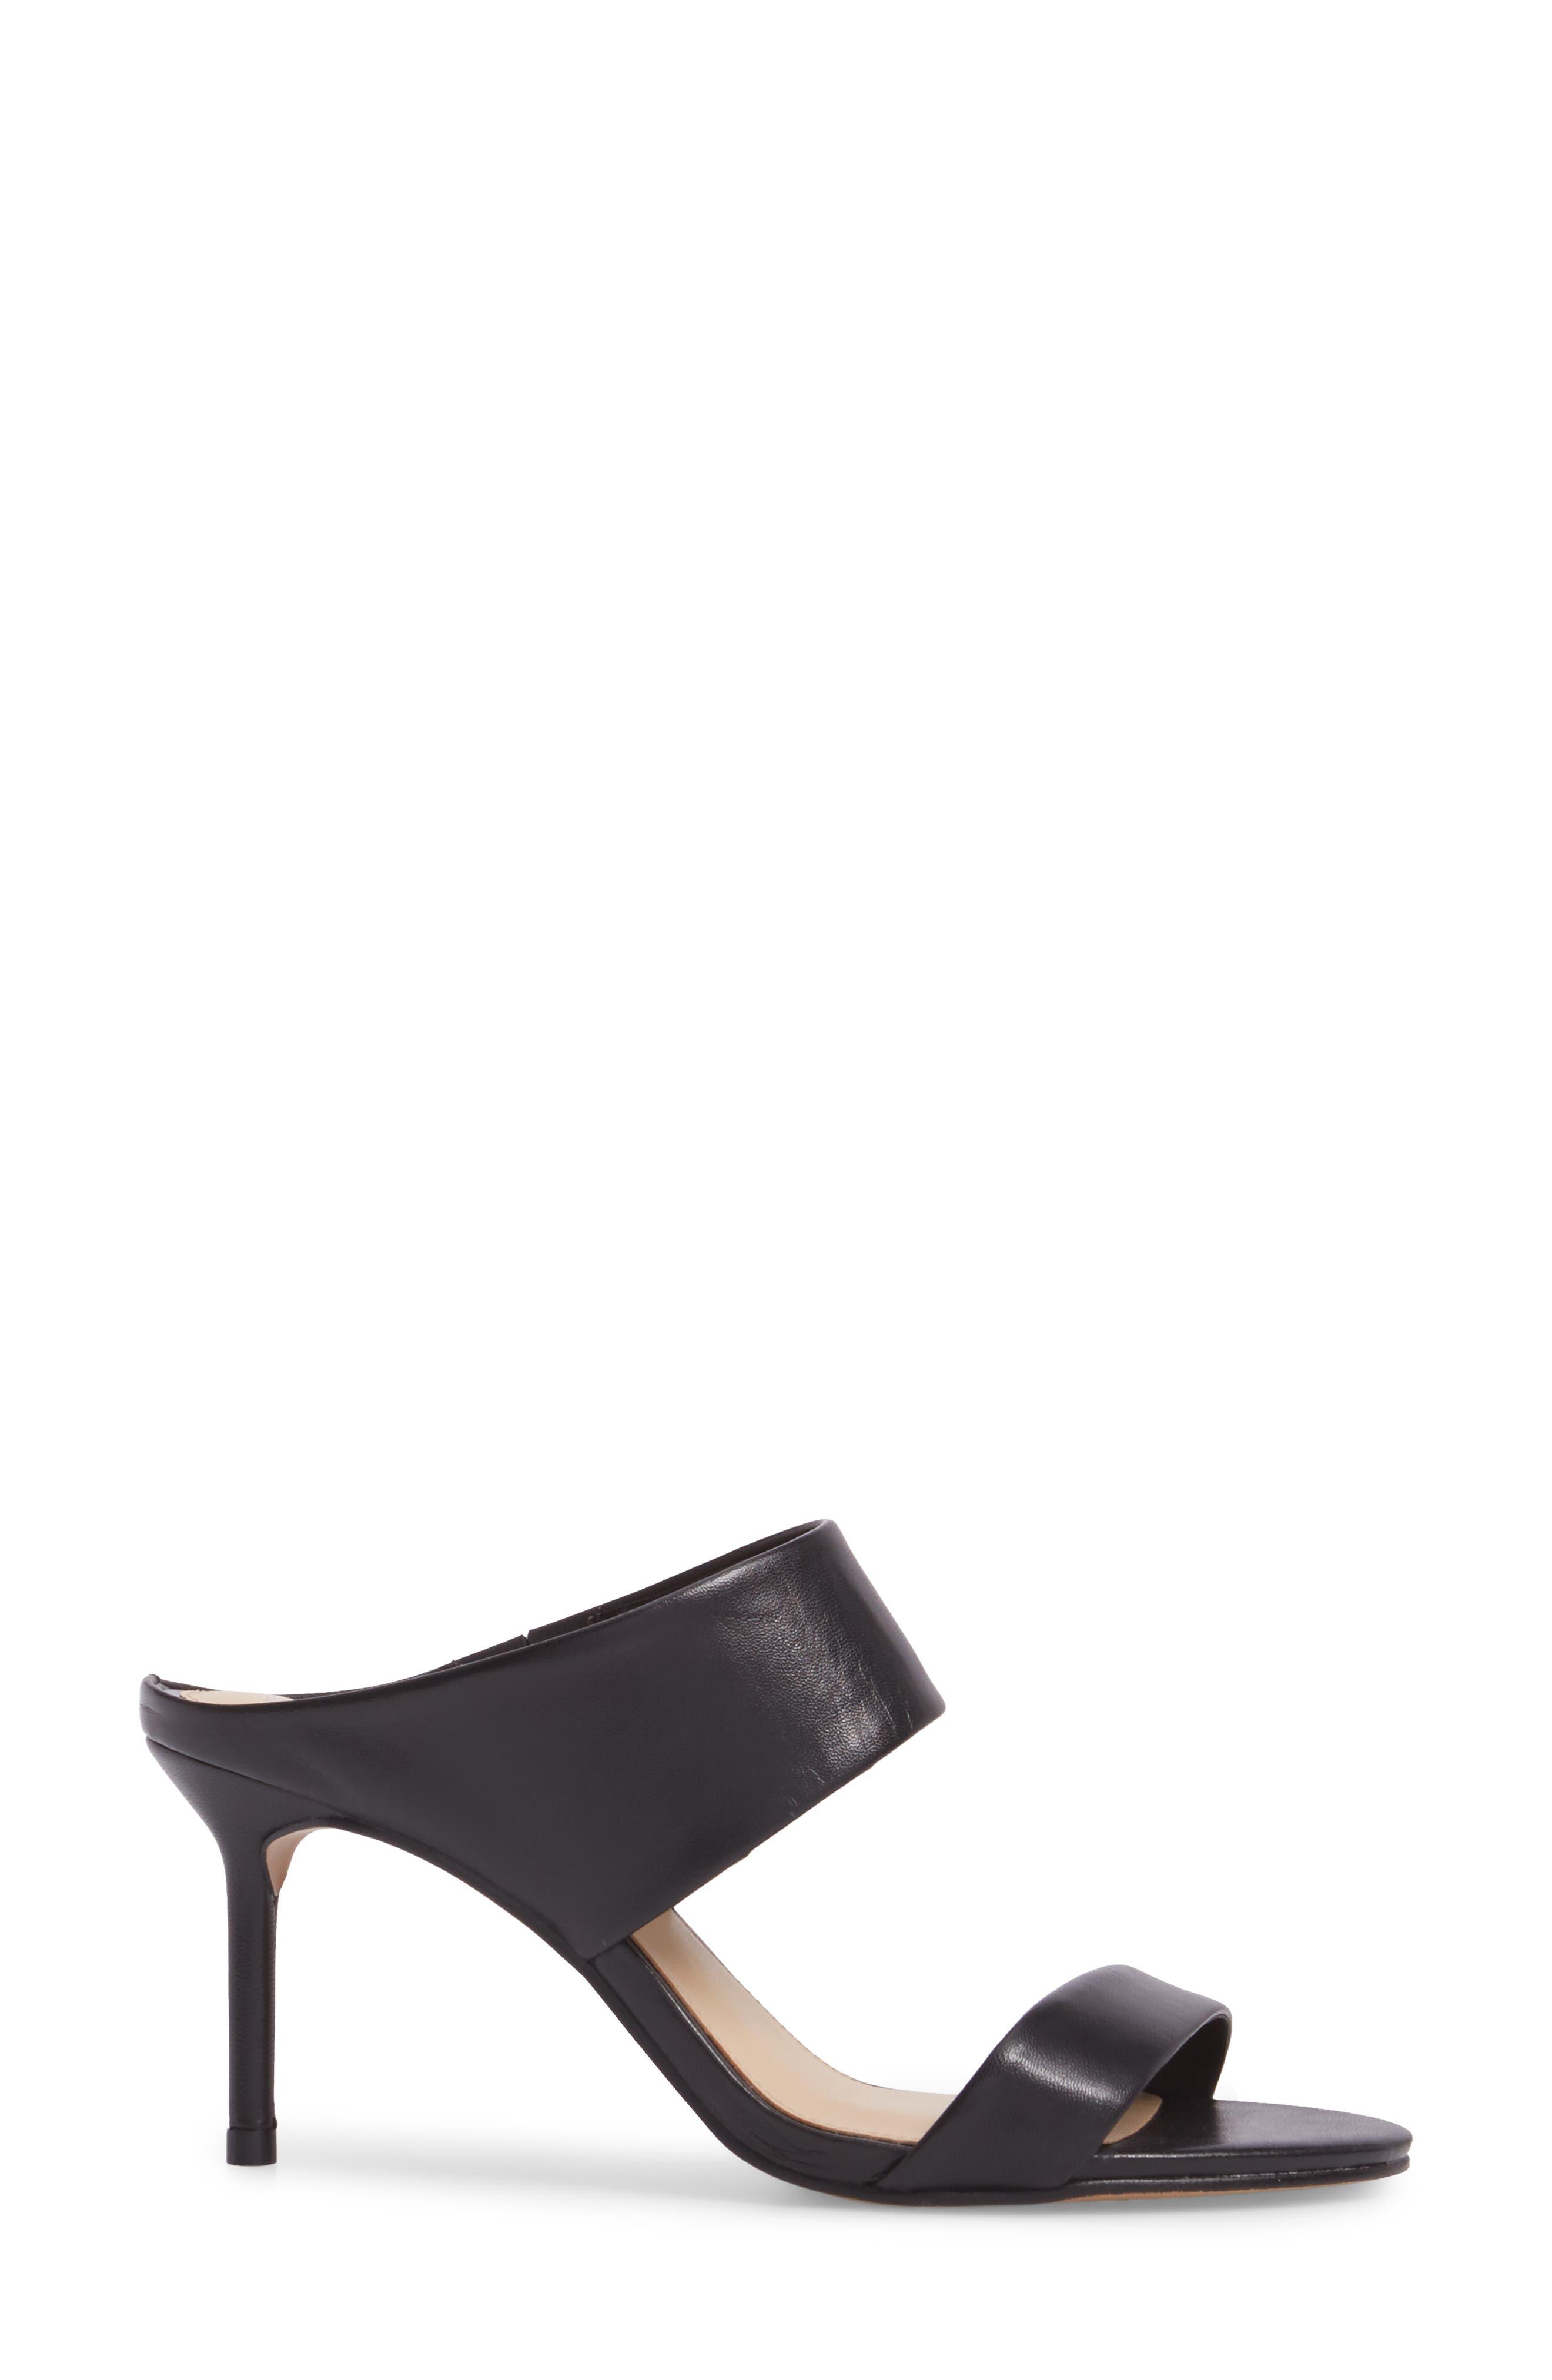 Navinta Sandal,                             Alternate thumbnail 3, color,                             Black Nappa Leather